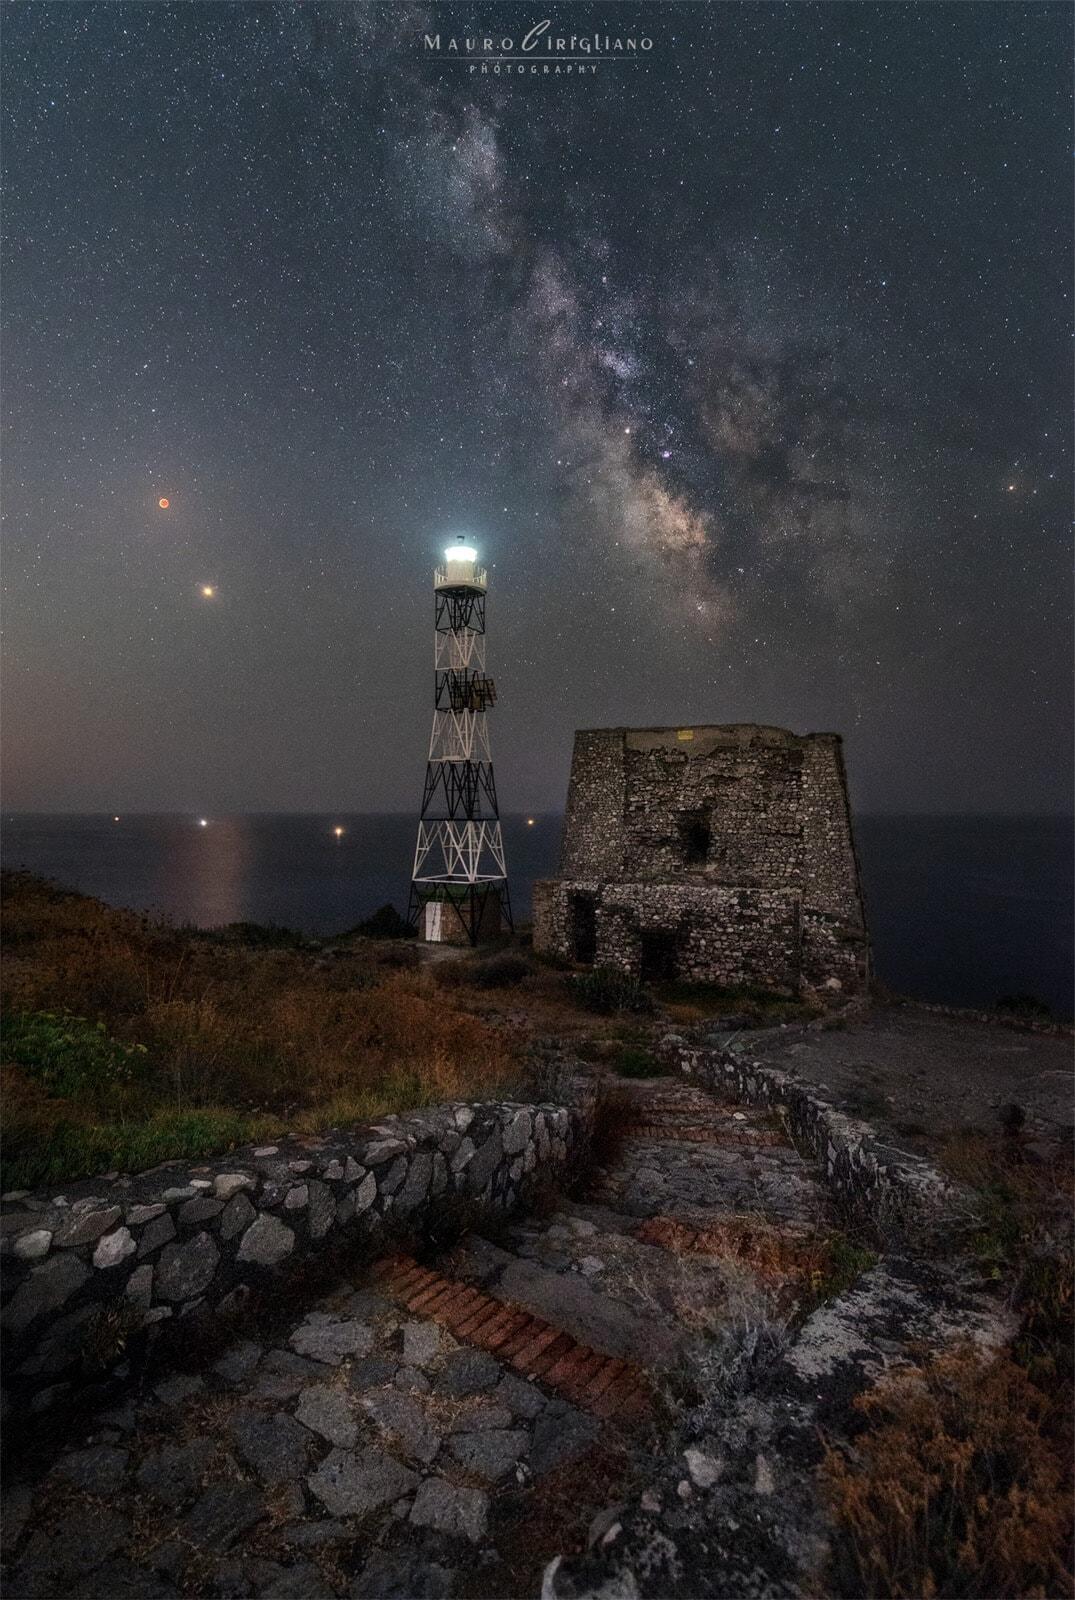 eclissi lunare totale e via lattea su antica torre saracena